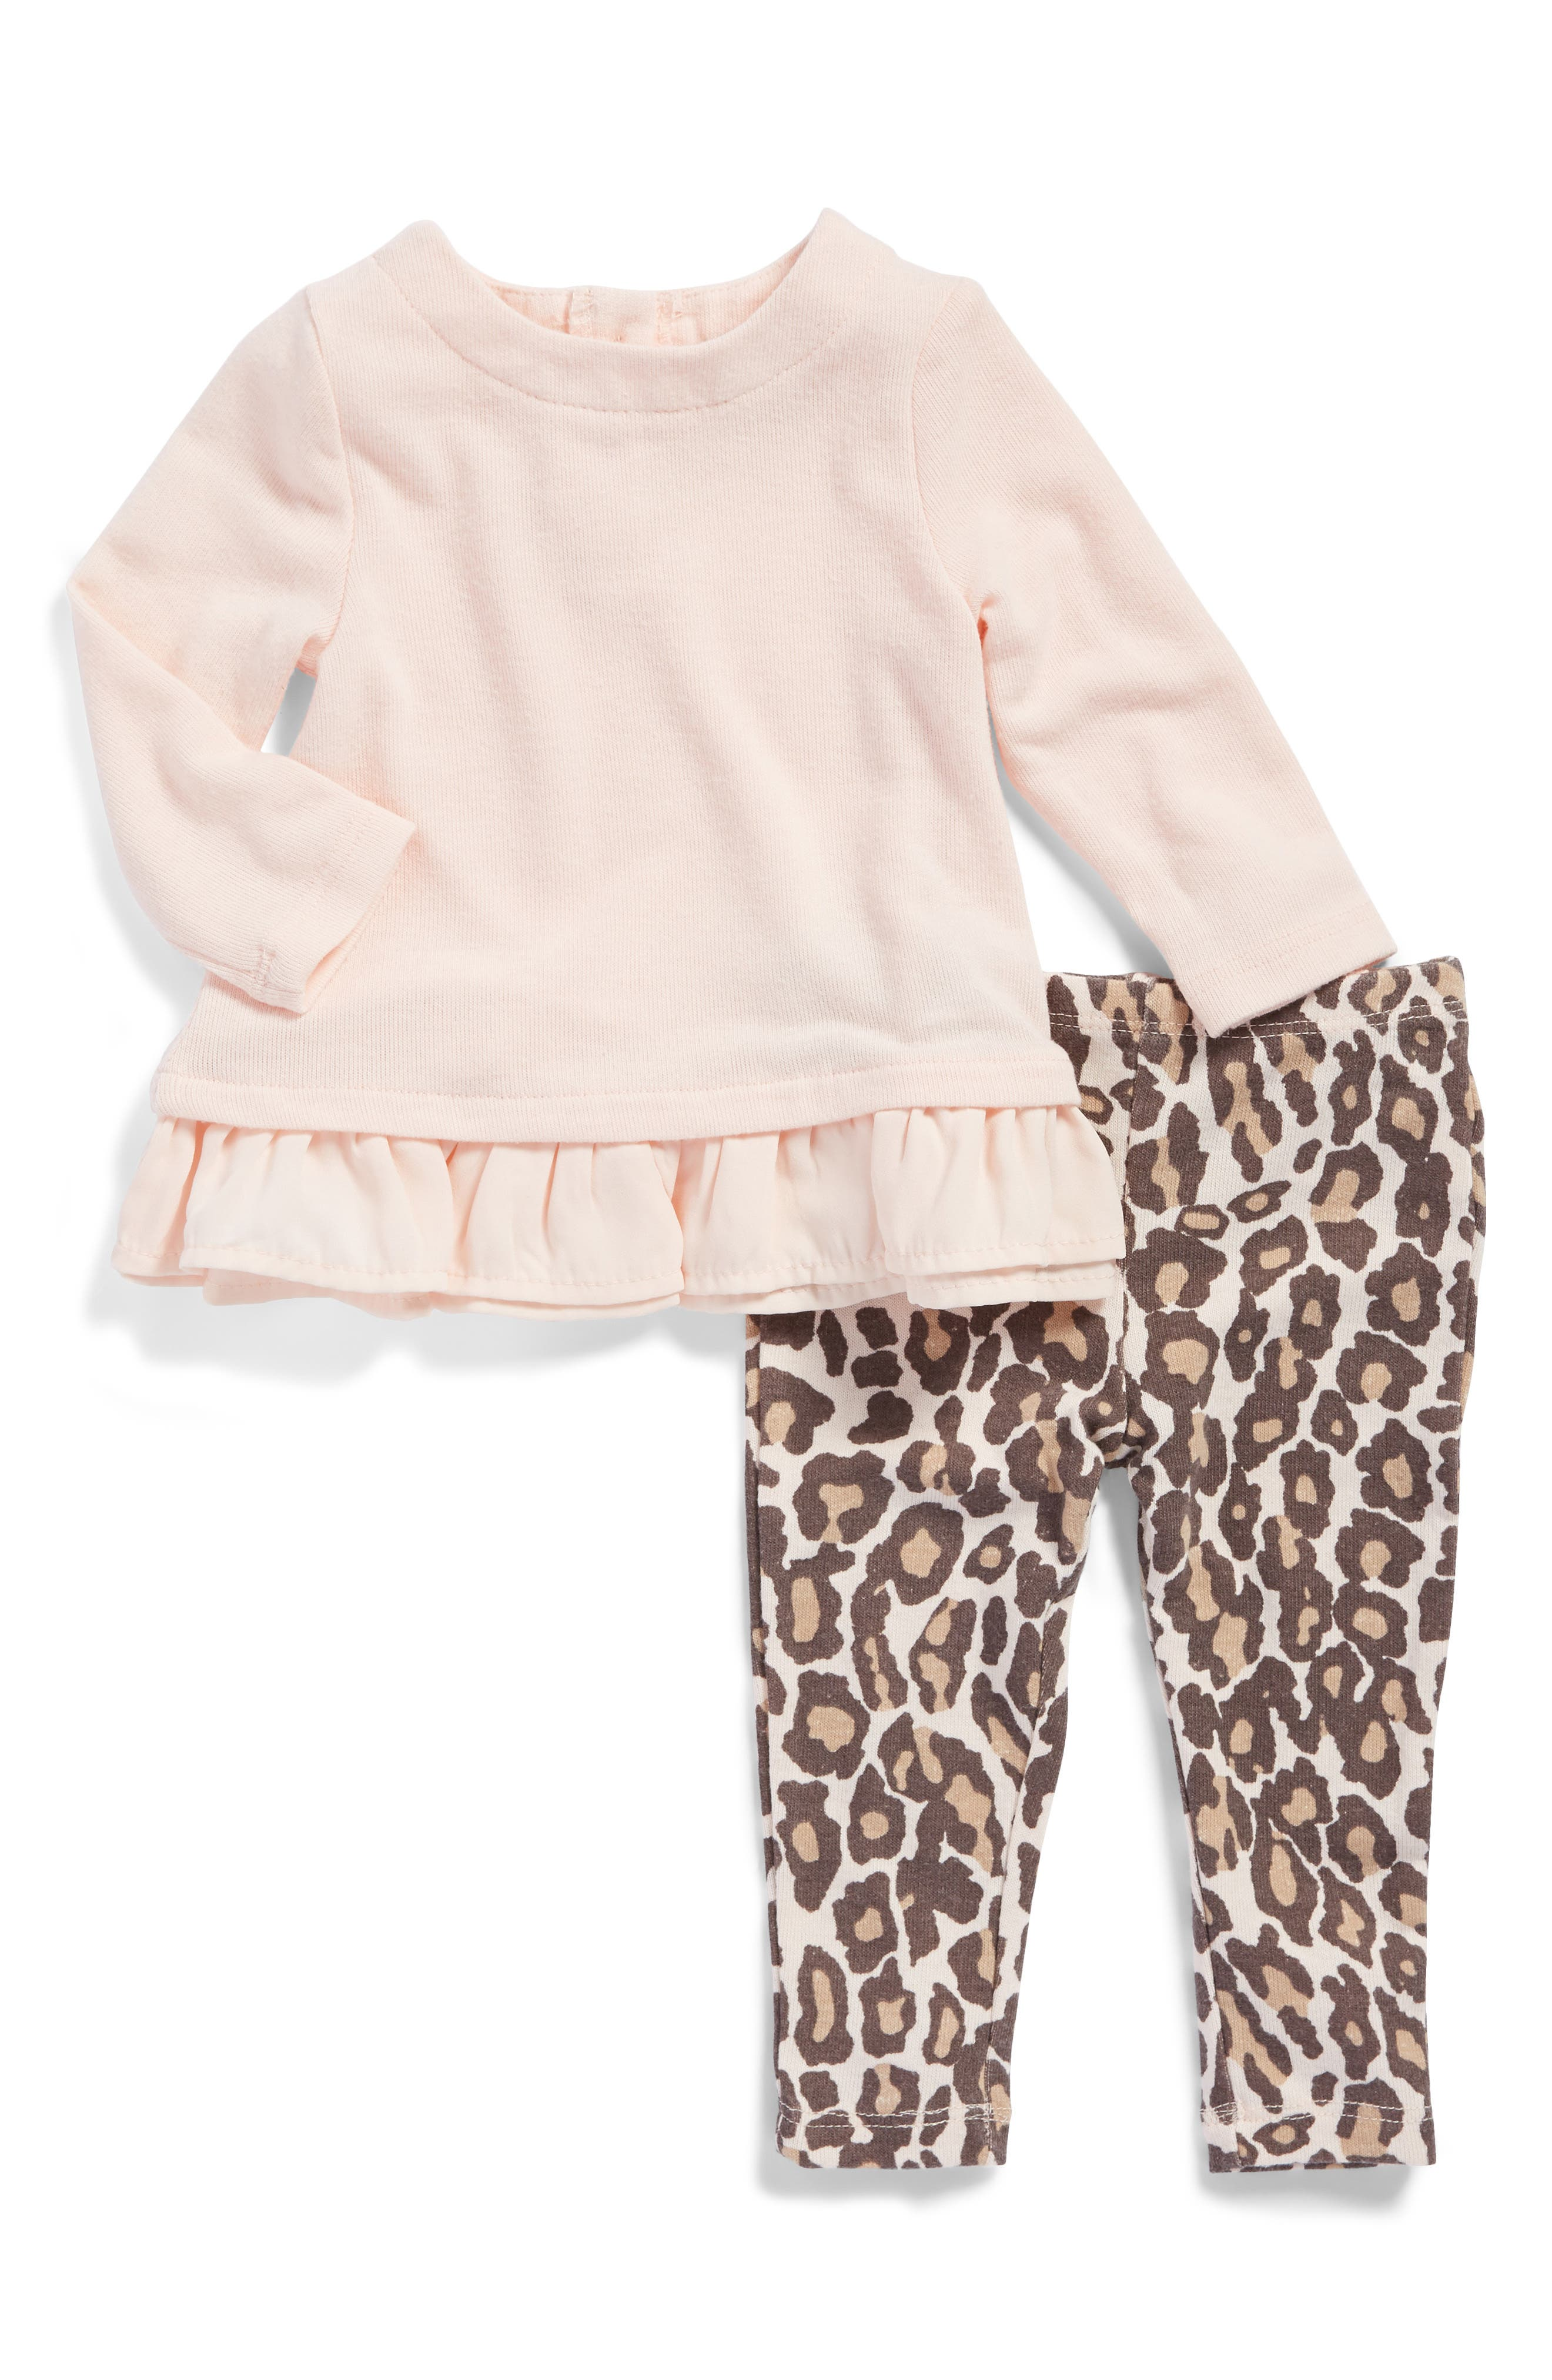 Splendid Top & Print Leggings Set (Baby Girls)